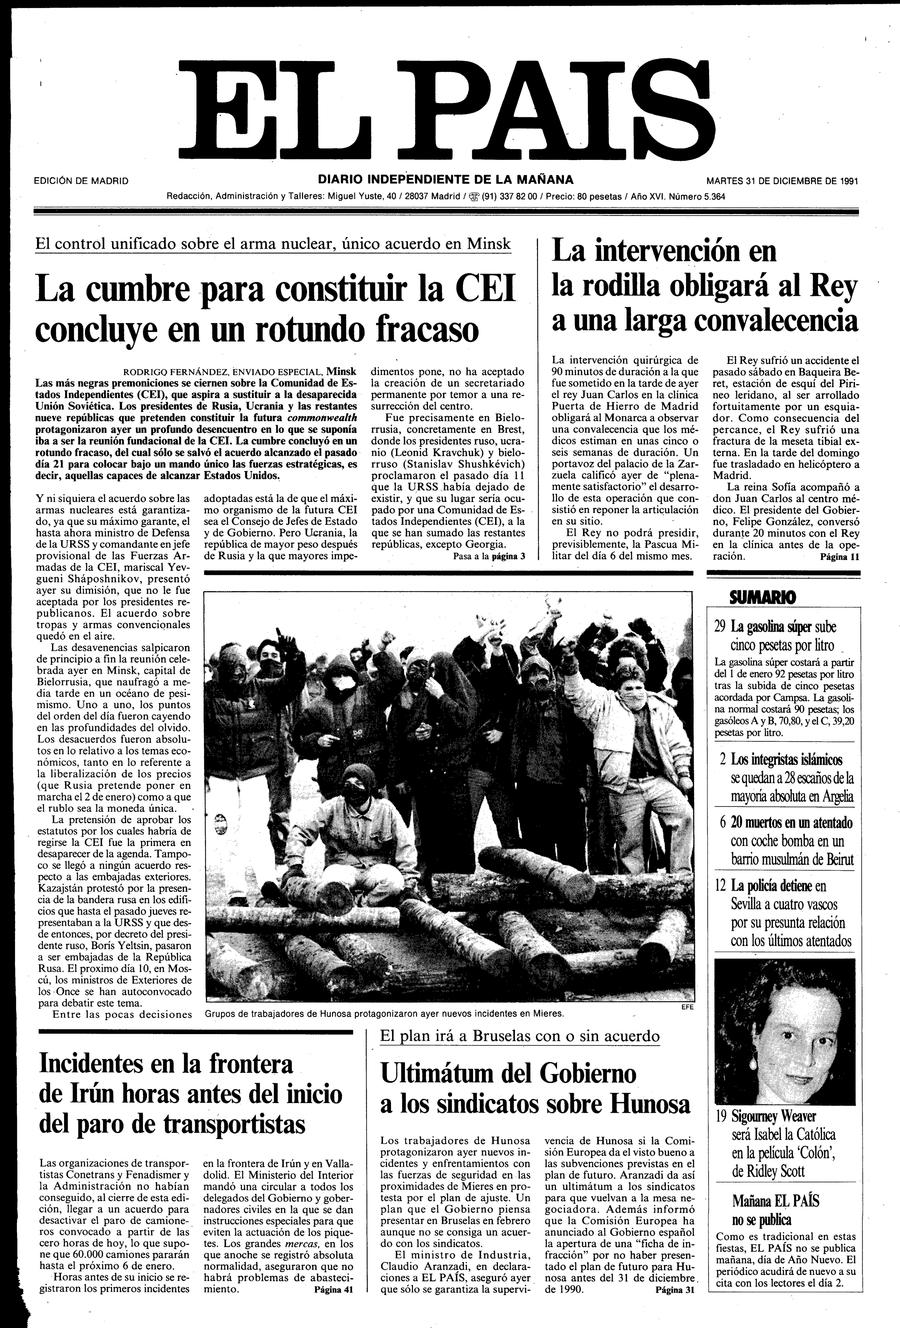 31 de Diciembre de 1991